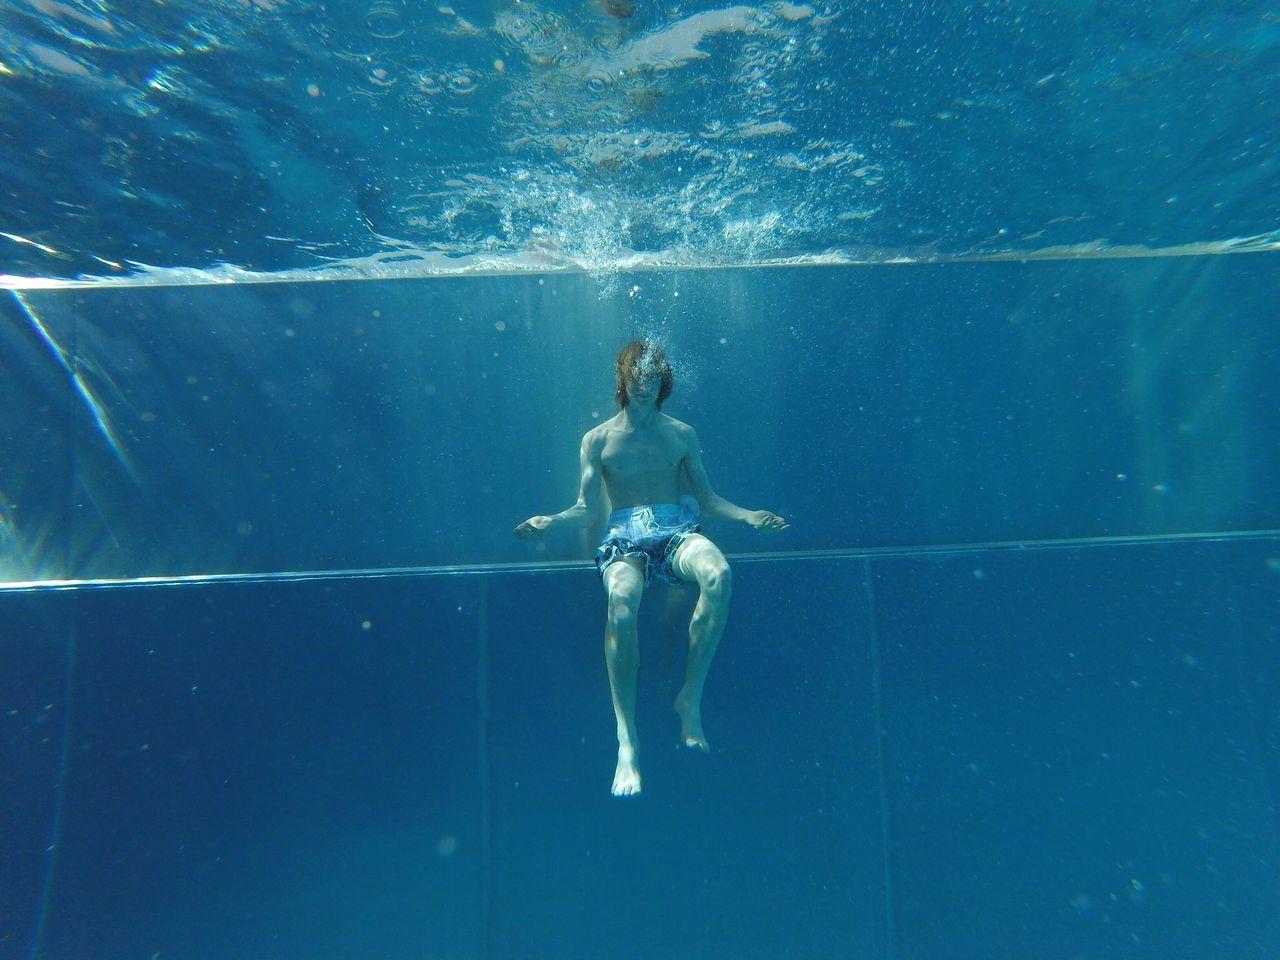 Shirtless Man Swimming Underwater